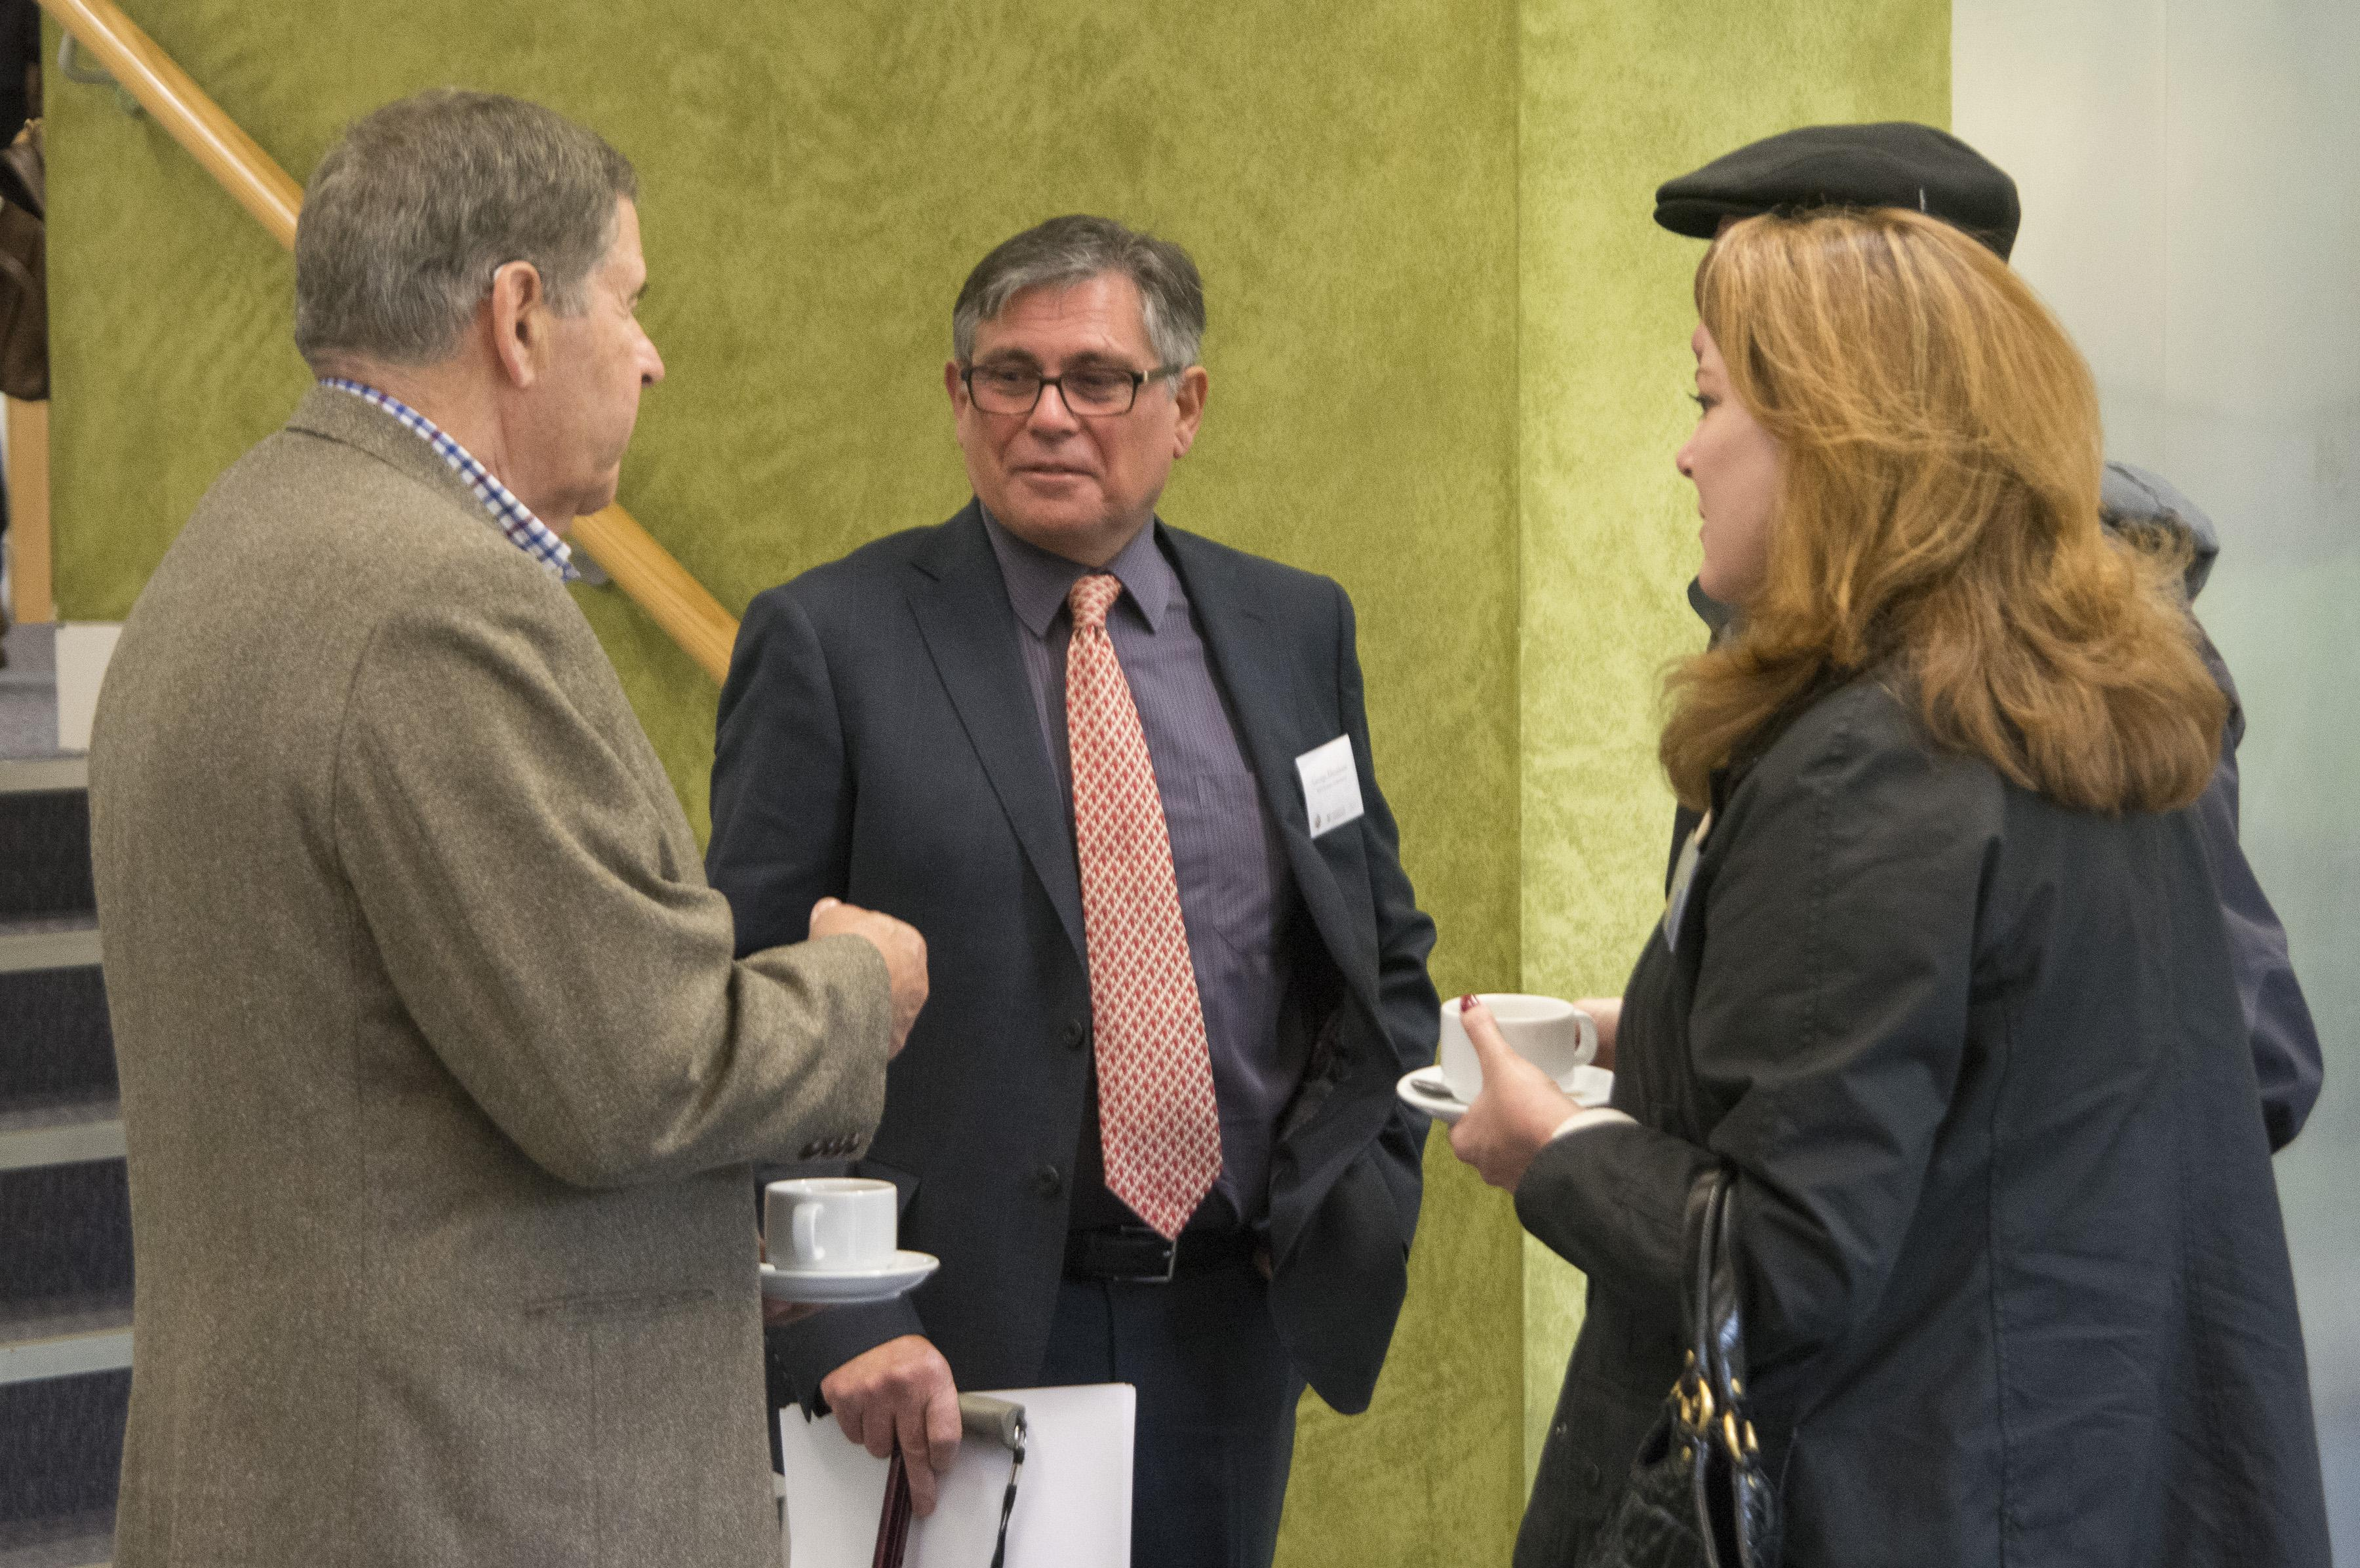 Rockell Hankin (Chairman of the Kavli Foundation Board of Directors), George Efstathiou and Lisa Hankin